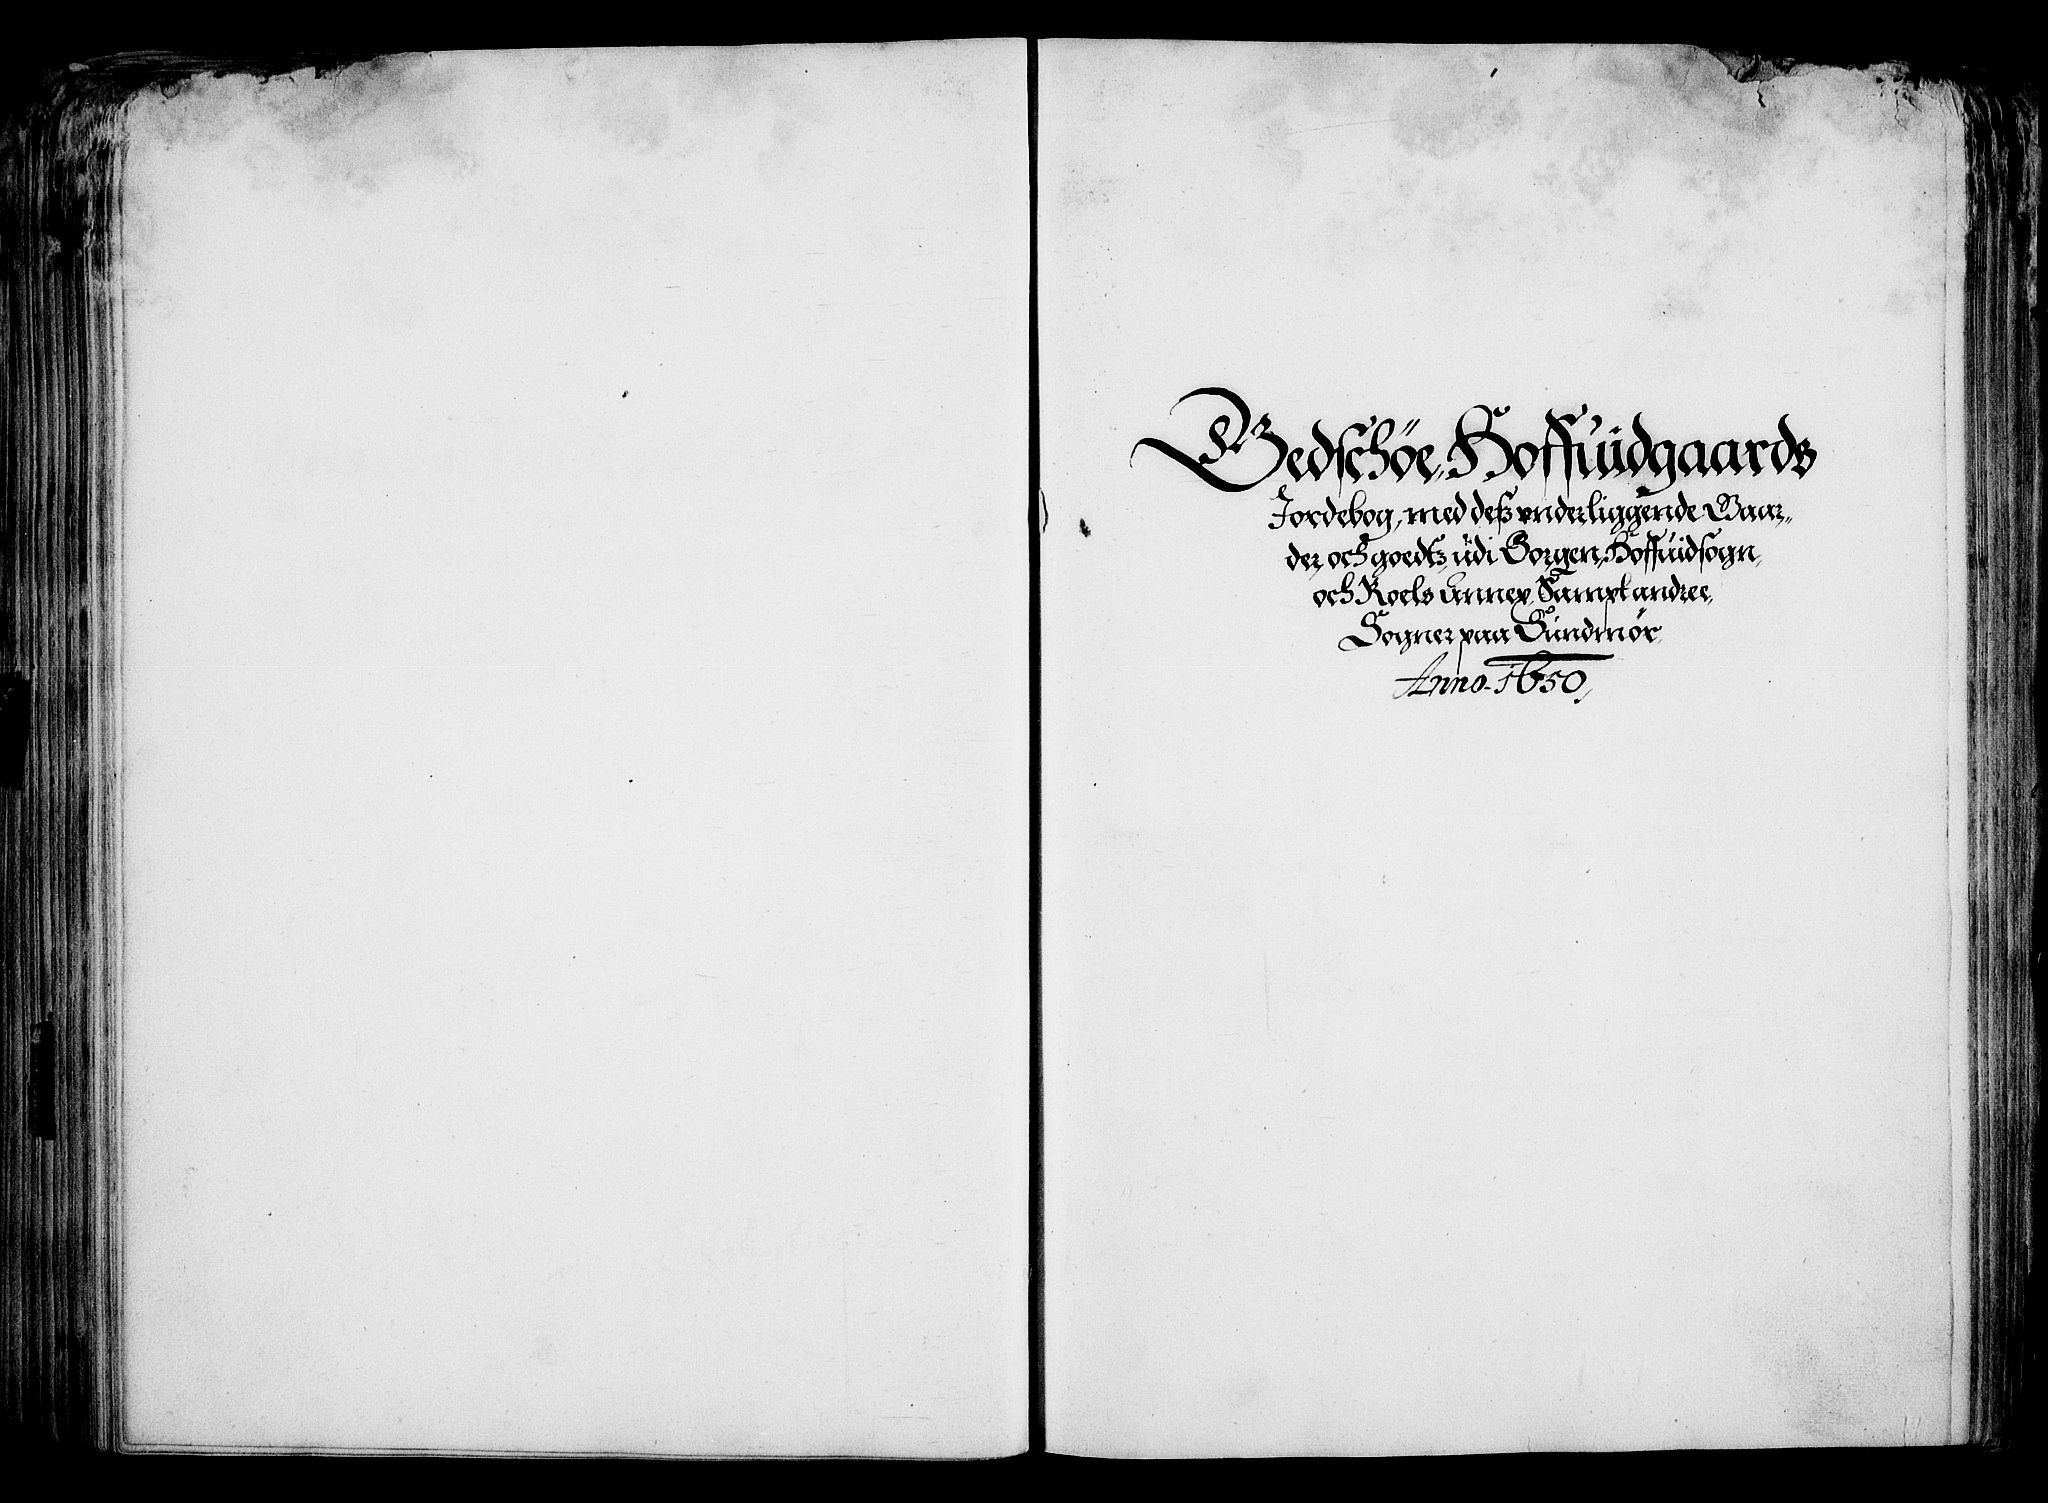 RA, Rentekammeret inntil 1814, Realistisk ordnet avdeling, On/L0001: Statens gods, 1651, s. 160